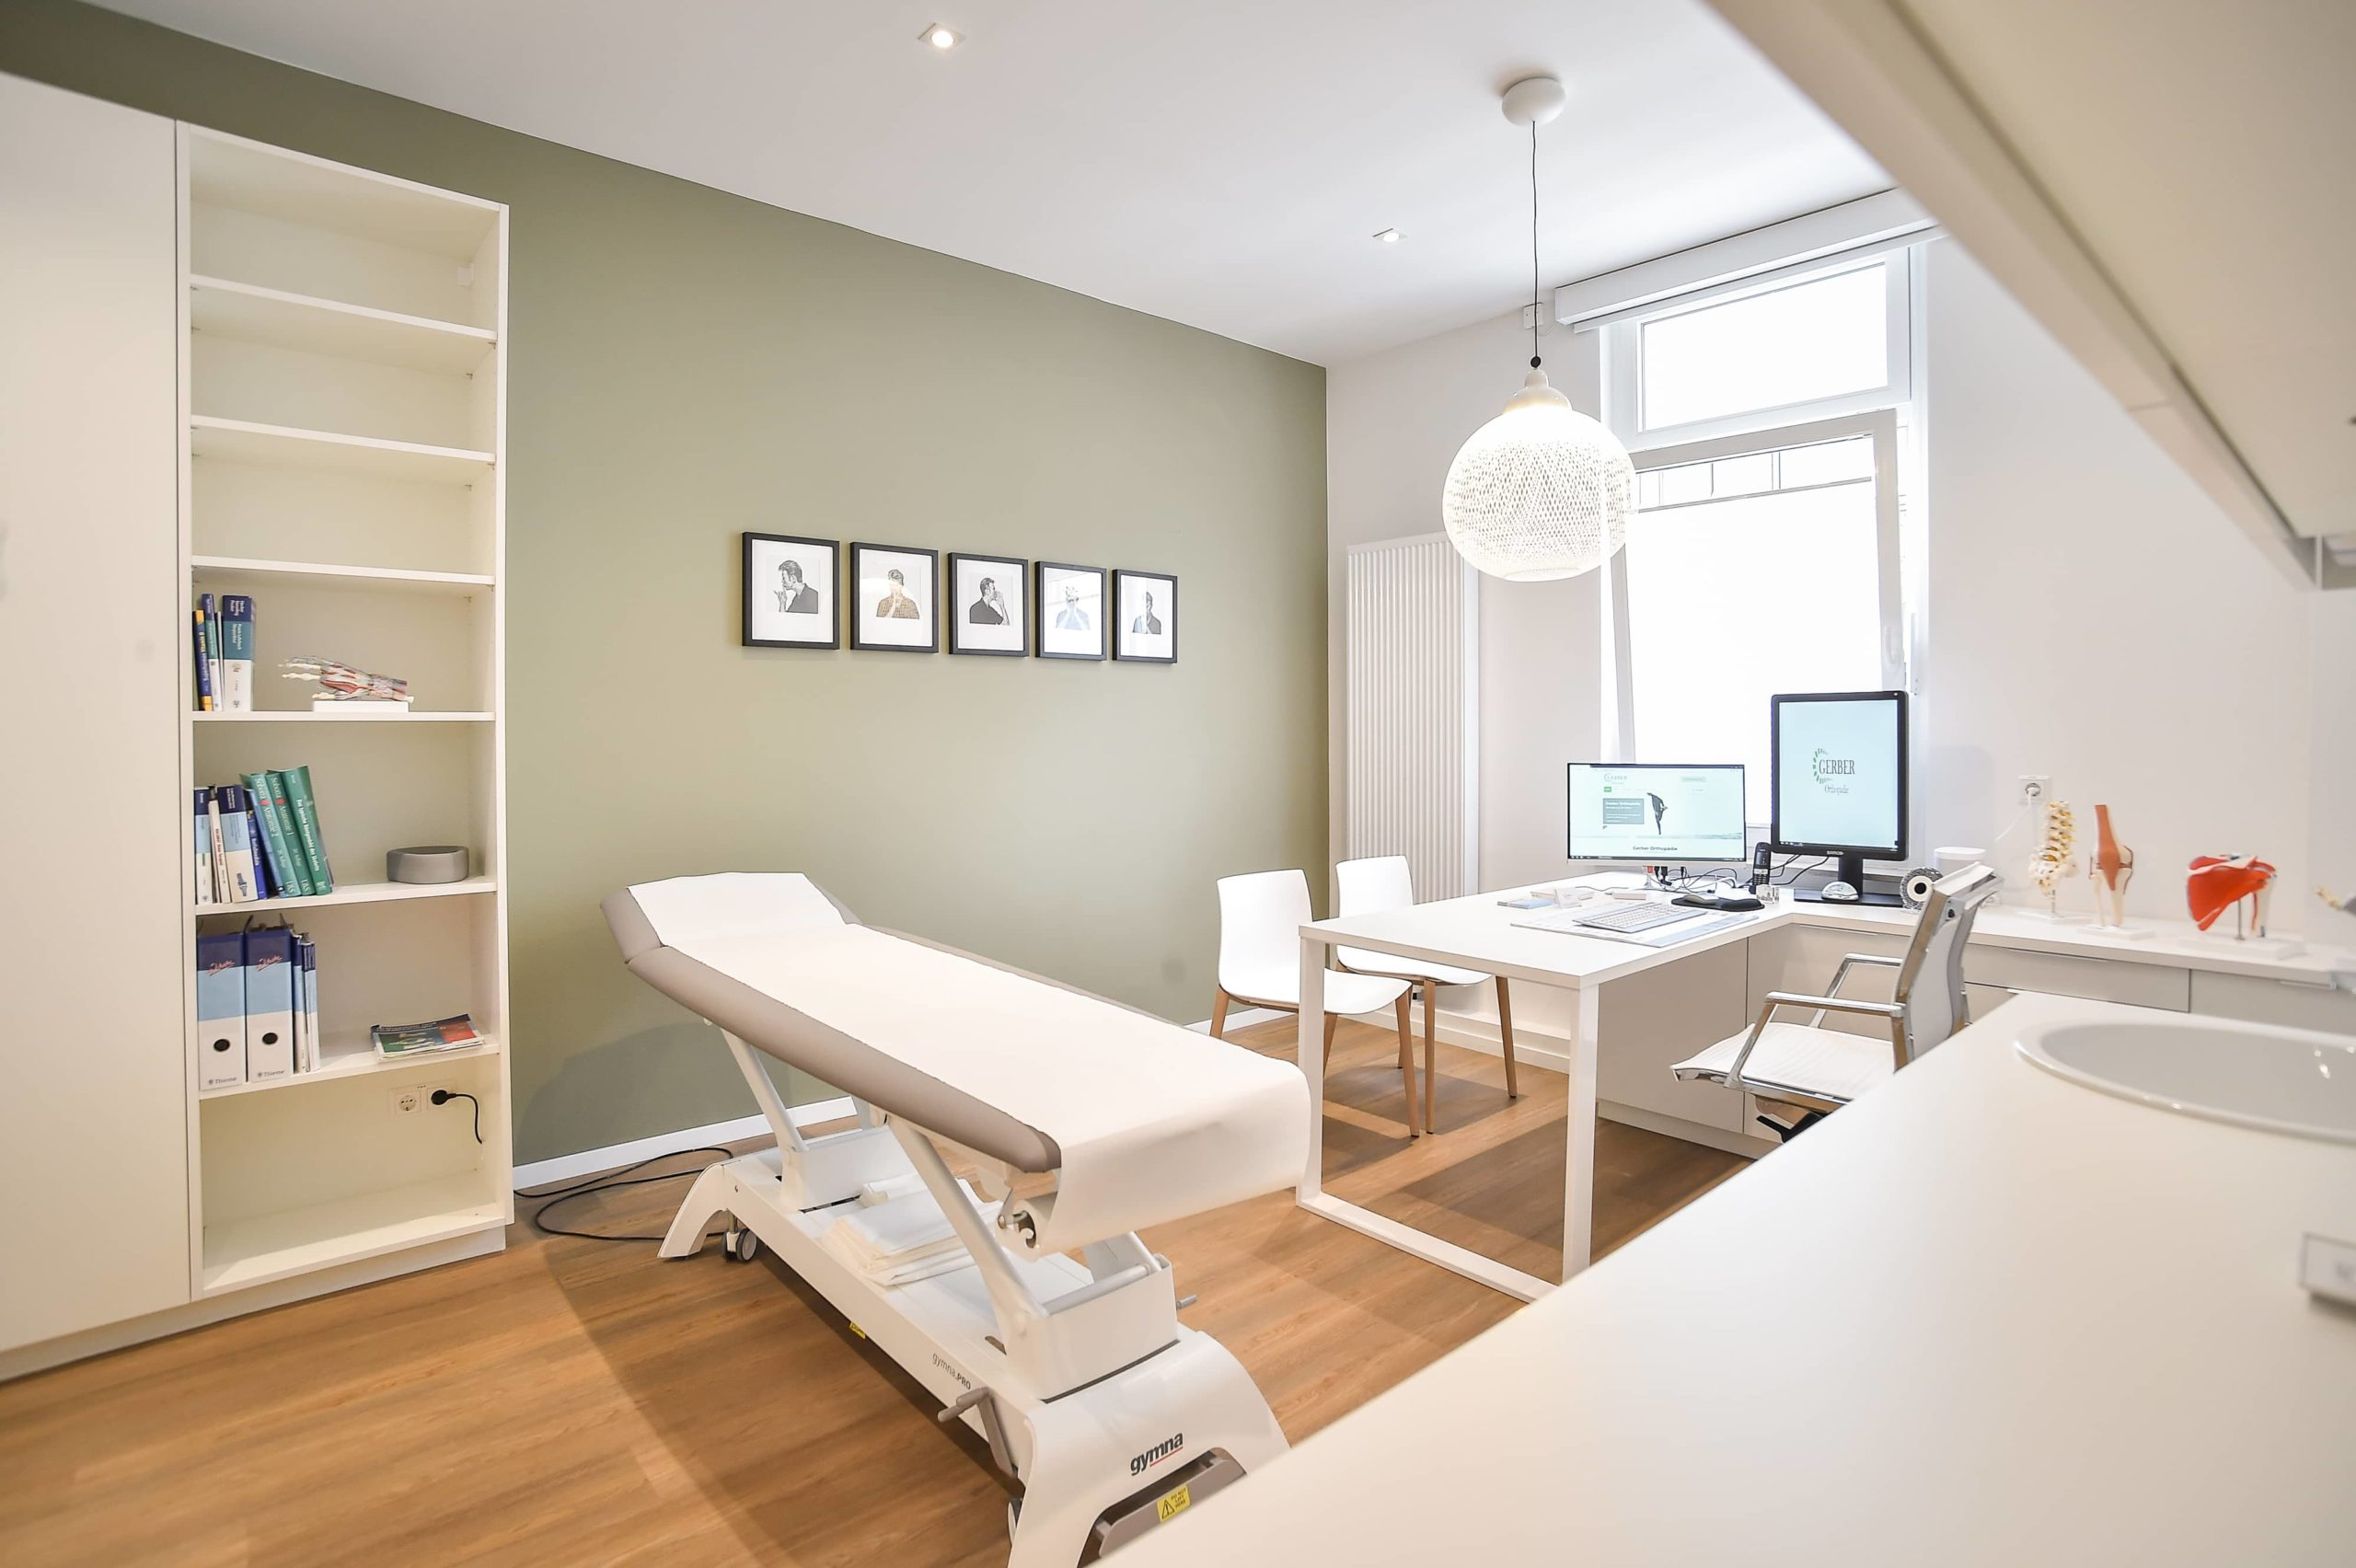 Behandlungsraum Gerber Orthopädie Praxis